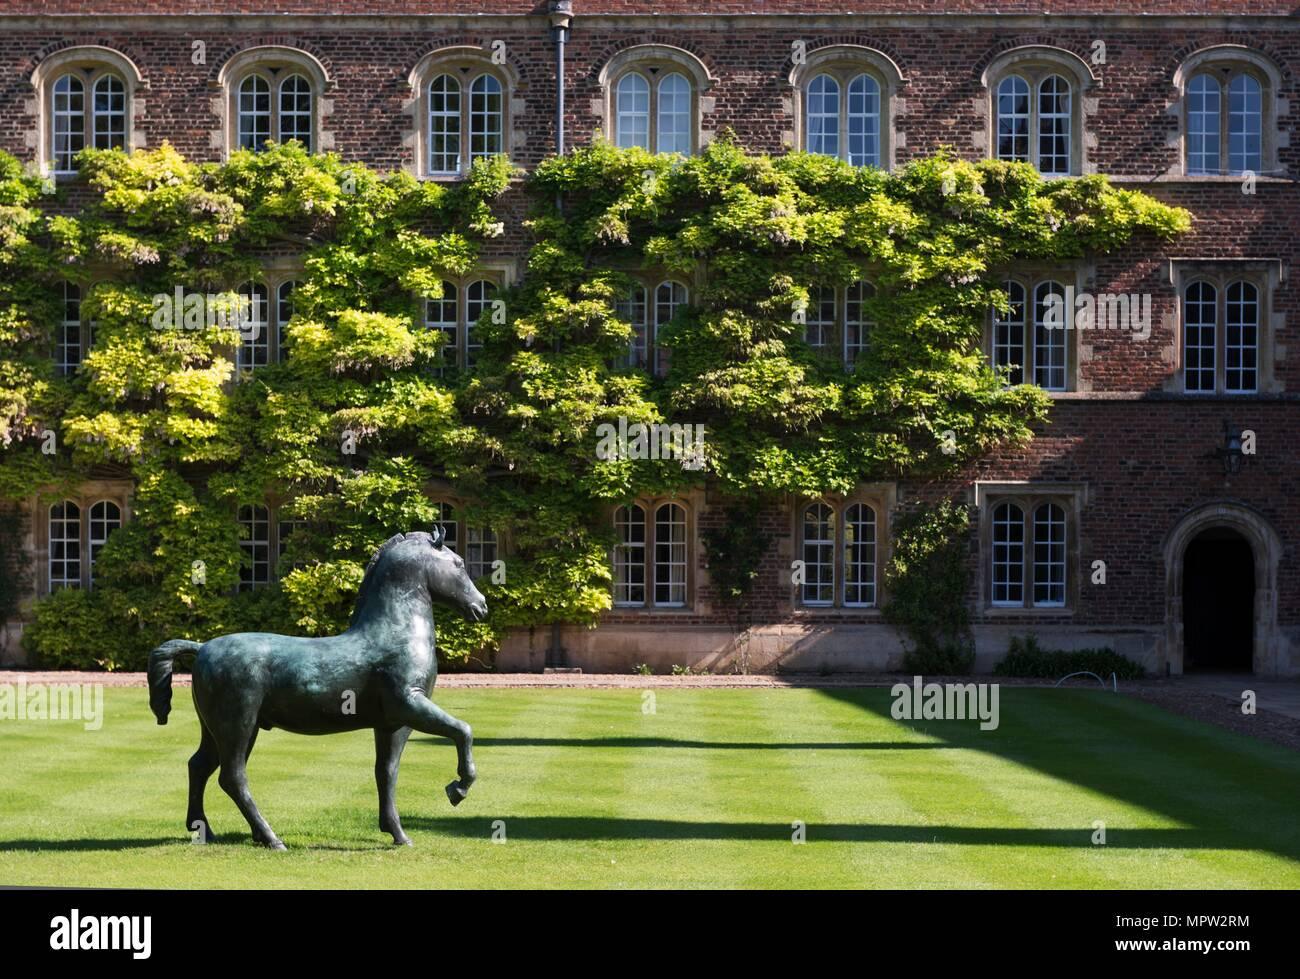 Bronze horse, sculpture by Barry Flanagan, Jesus College, Cambridge, Cambridgeshire, 2015.  Artist: James O Davies. - Stock Image